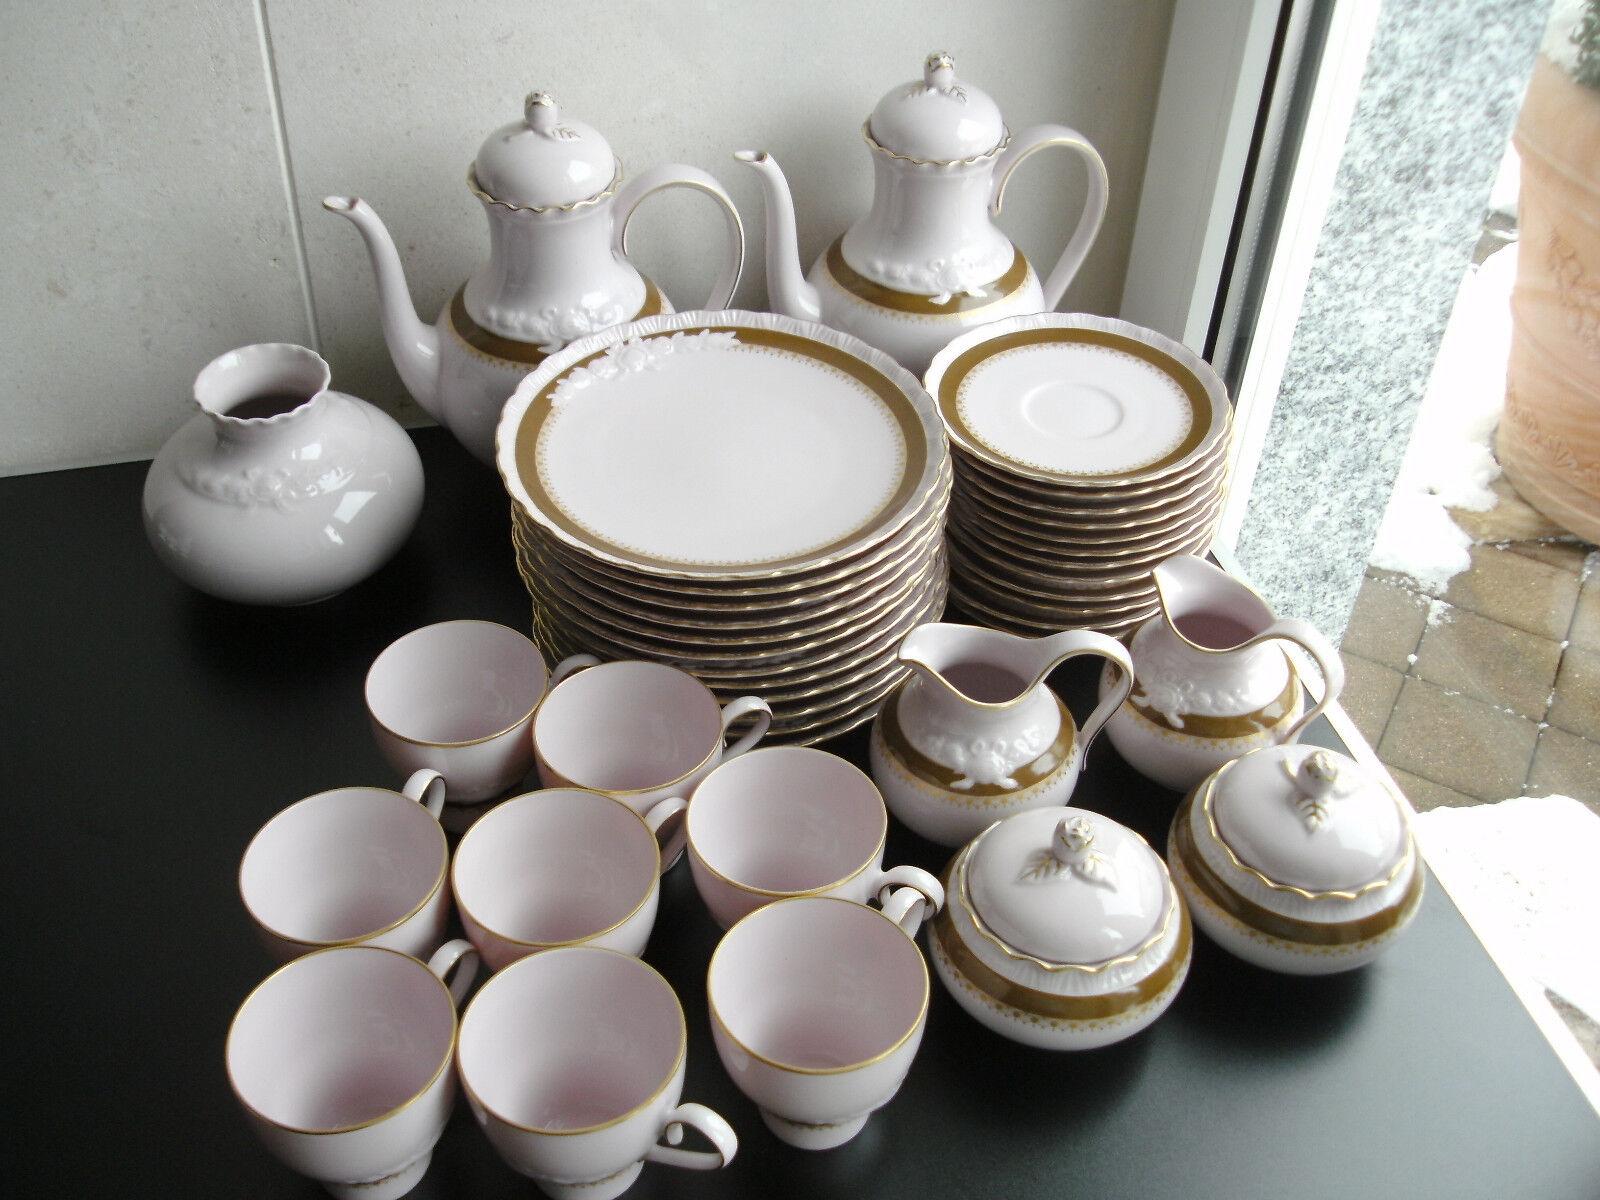 Hutschenreuther Kaffeeservice Porcelaine rosé 39 Teile